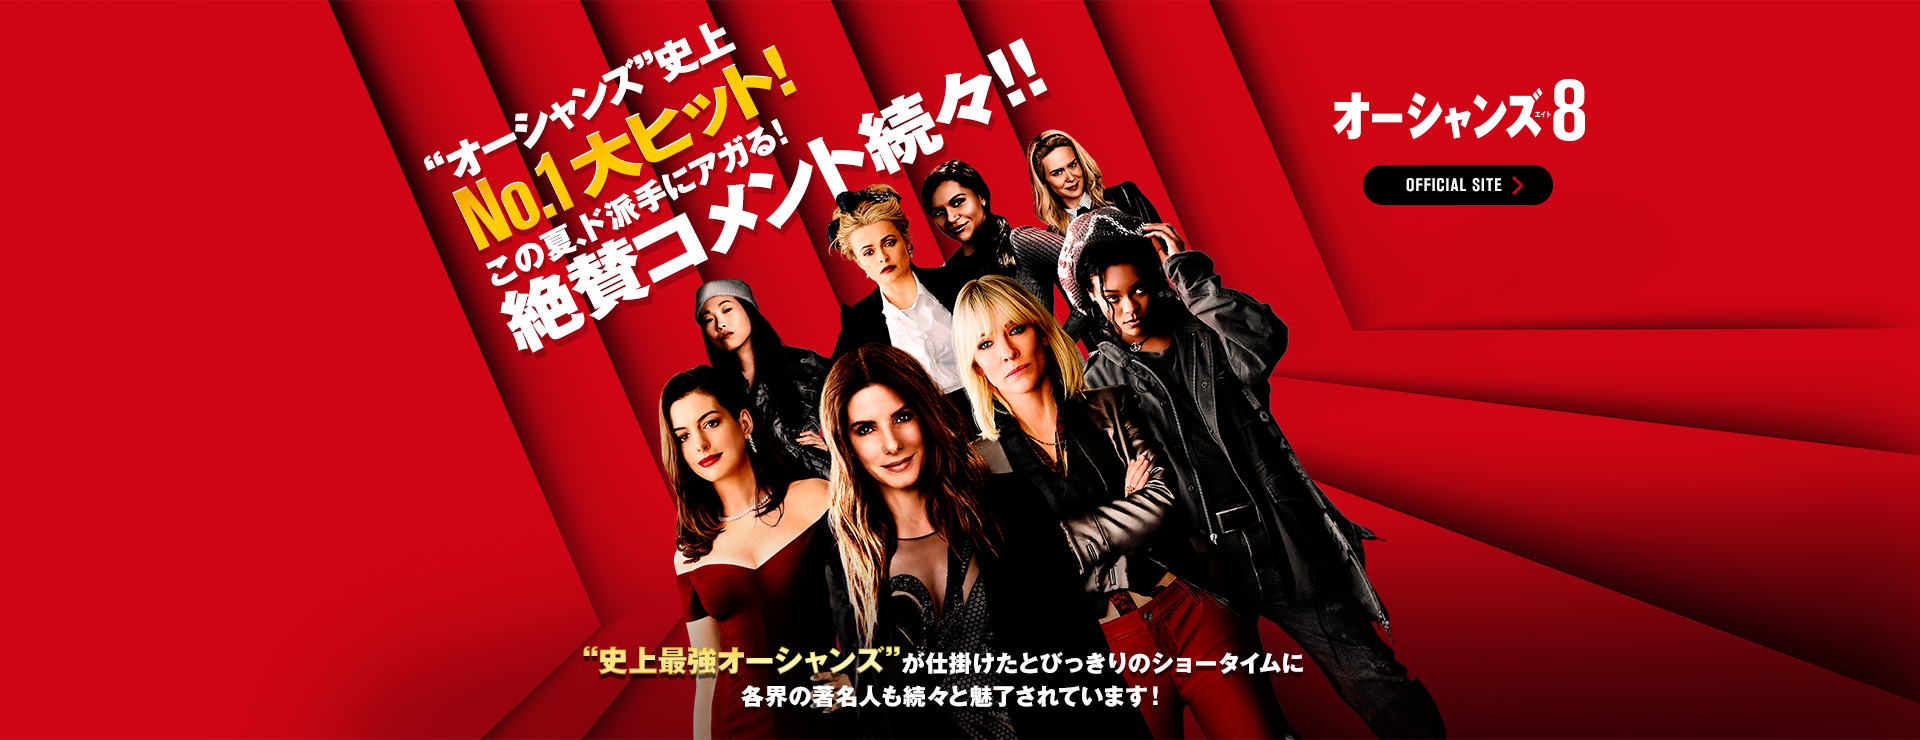 bd60d6cb533f4 映画『オーシャンズ8』公開記念プレゼントキャンペーン!